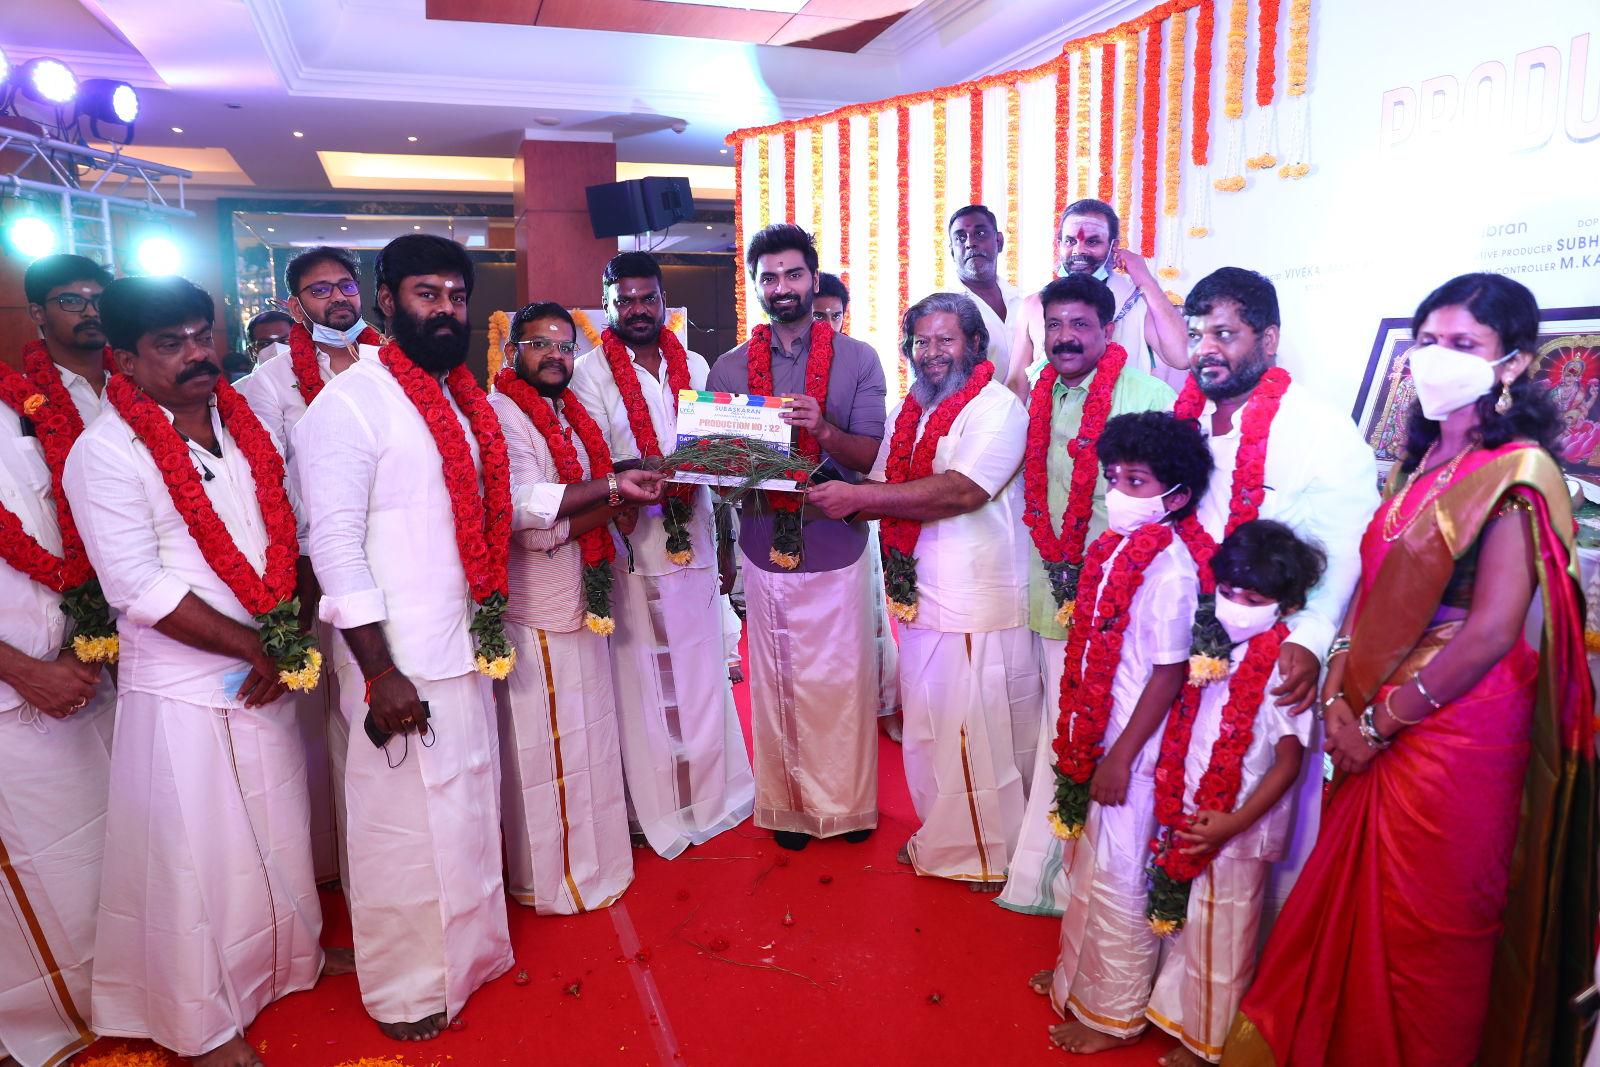 Actor Atharvaa Murali Rajkiran Director Sarkunam Film launched